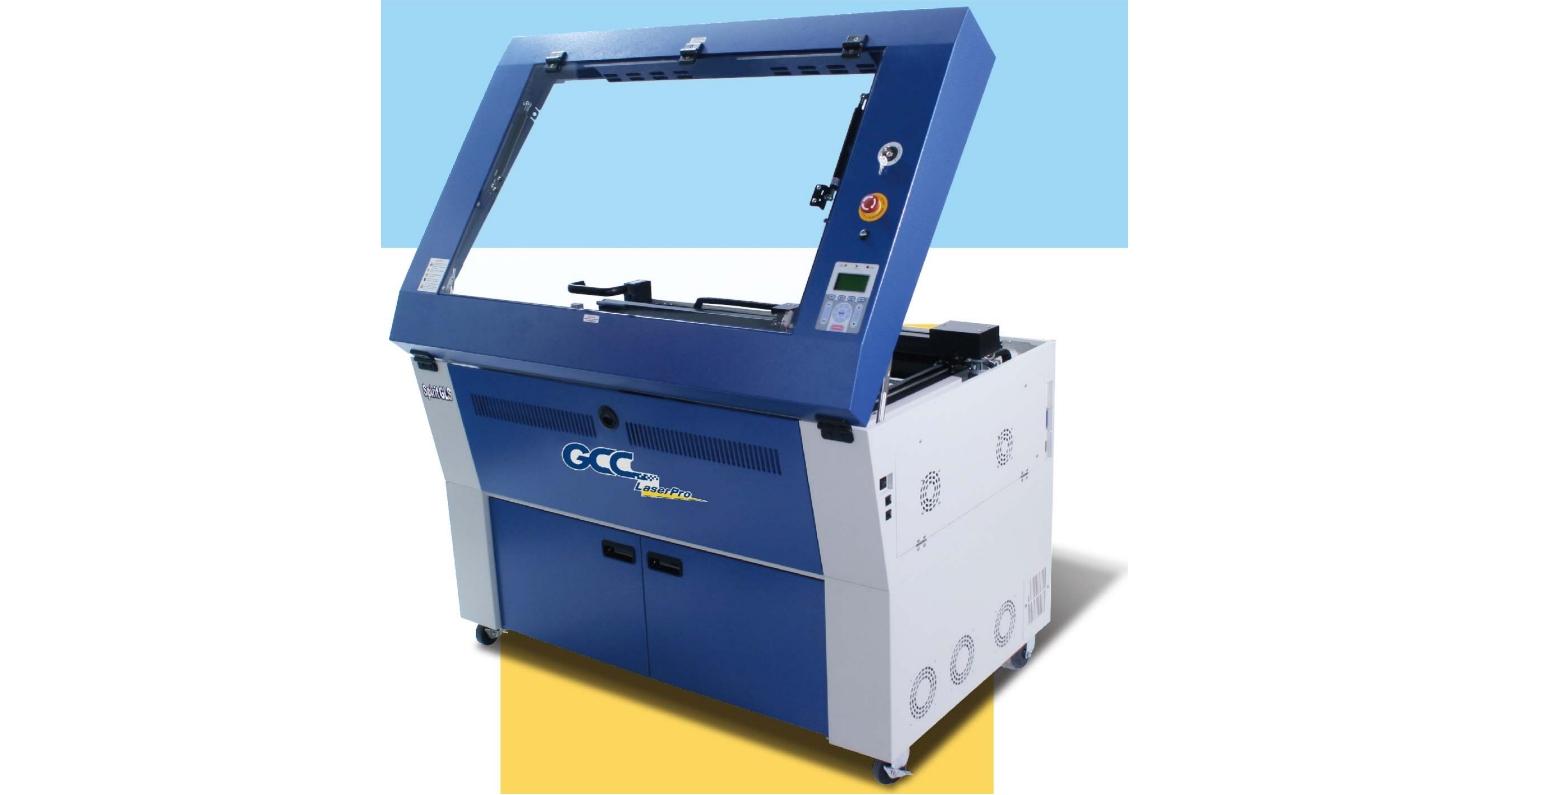 GCC LaserPro Spirit GE 60. Преимущества